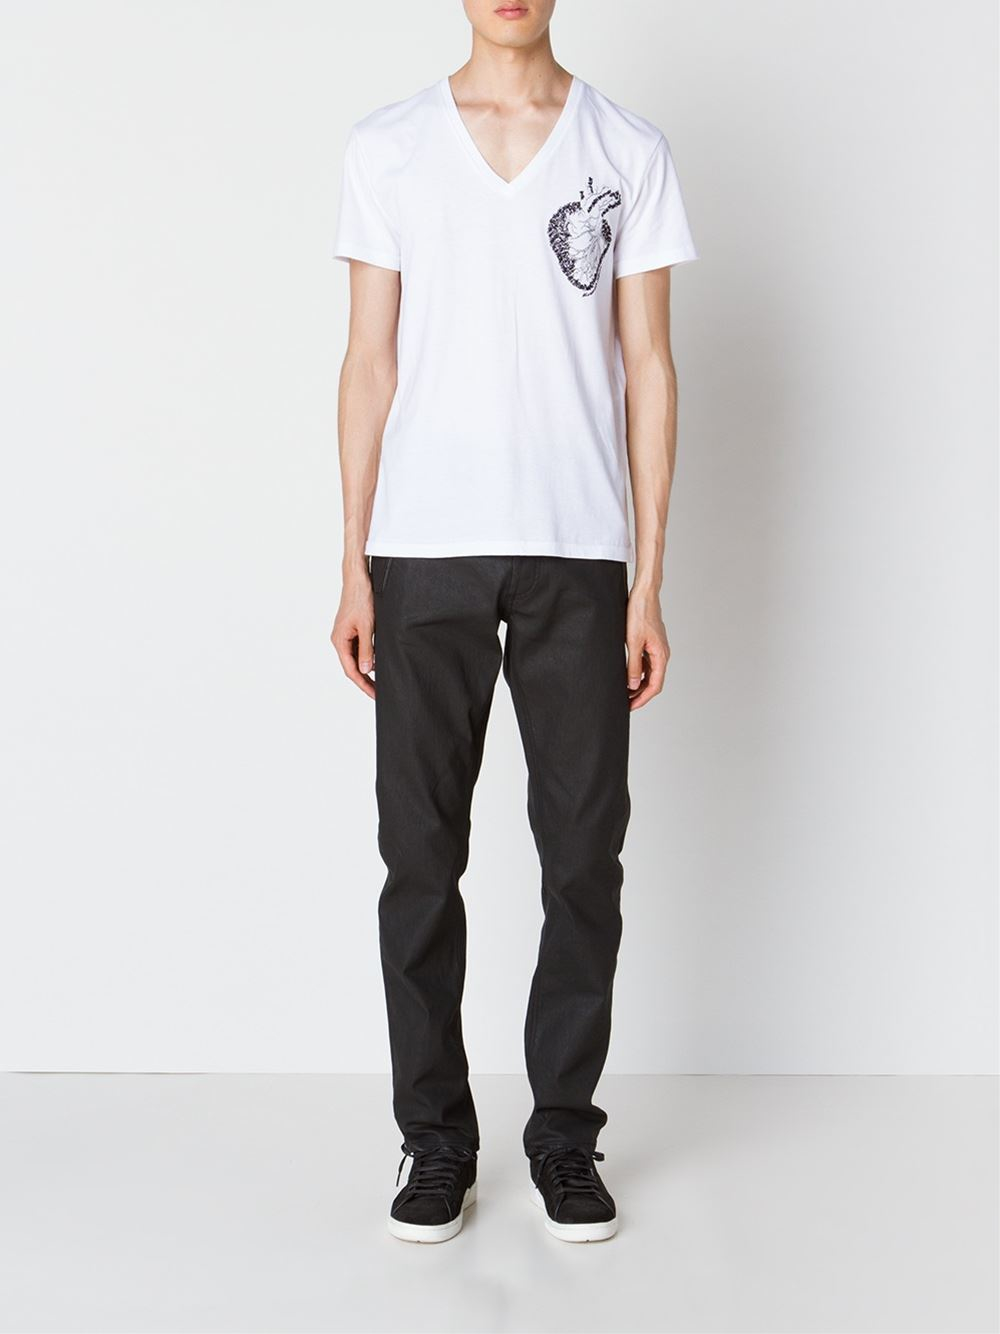 Alexander mcqueen embroidered heart t shirt in white for for Alexander mcqueen shirt men